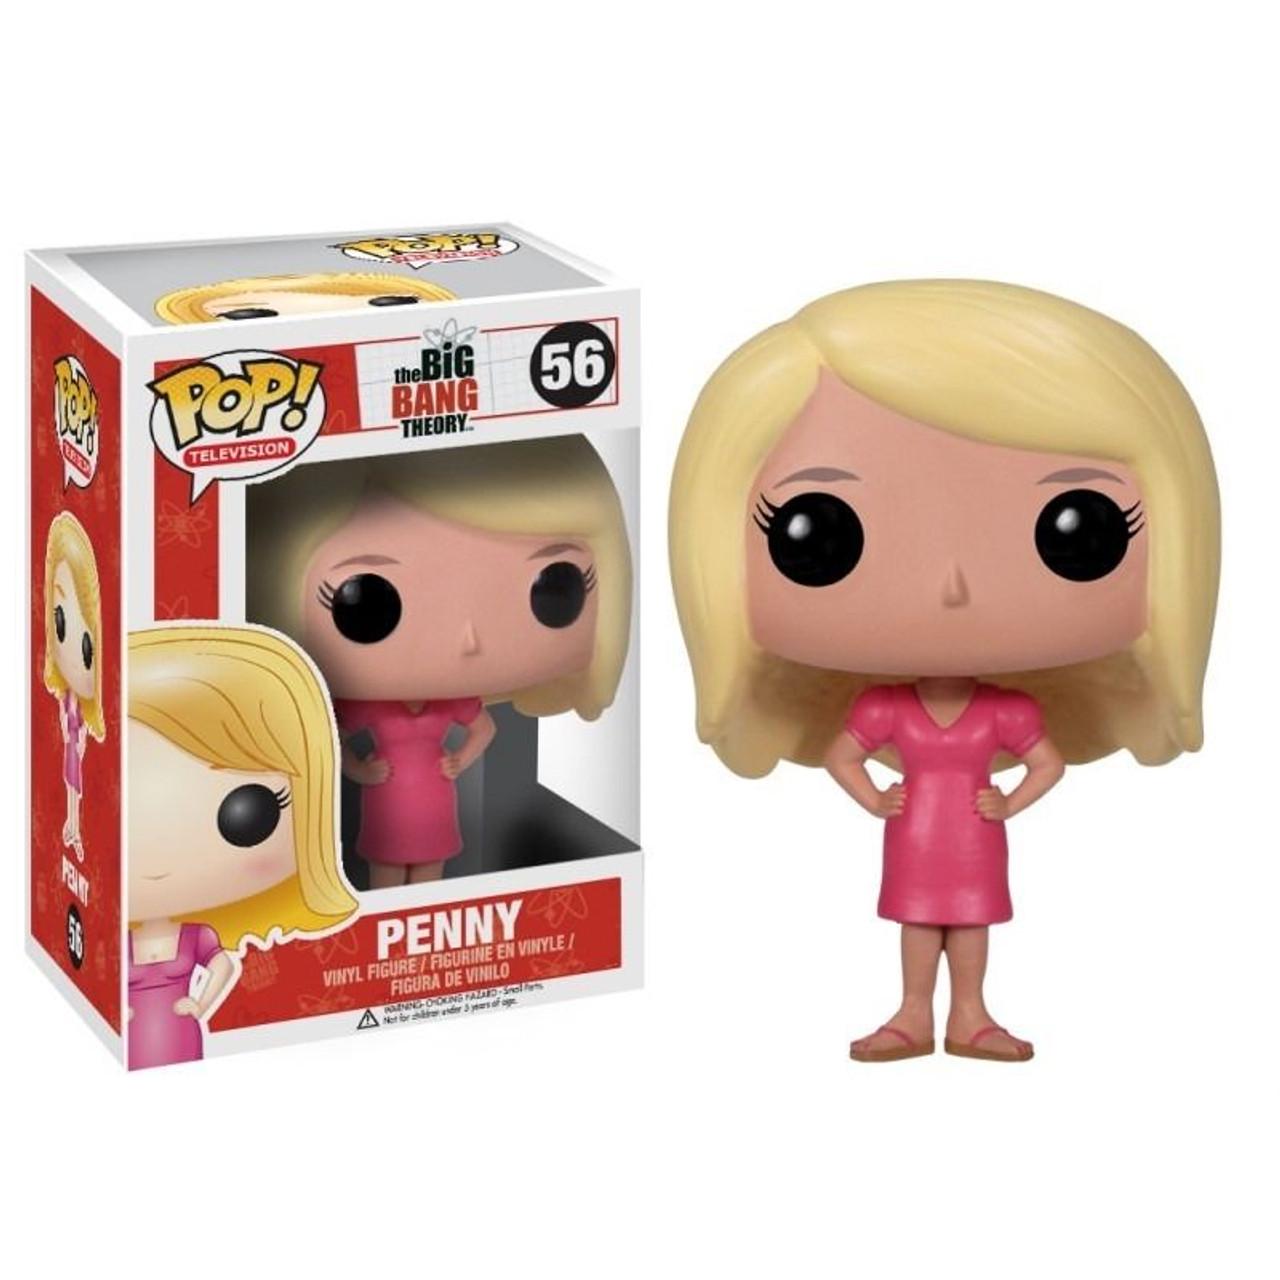 Pop Funko Big Bang Theory Penny